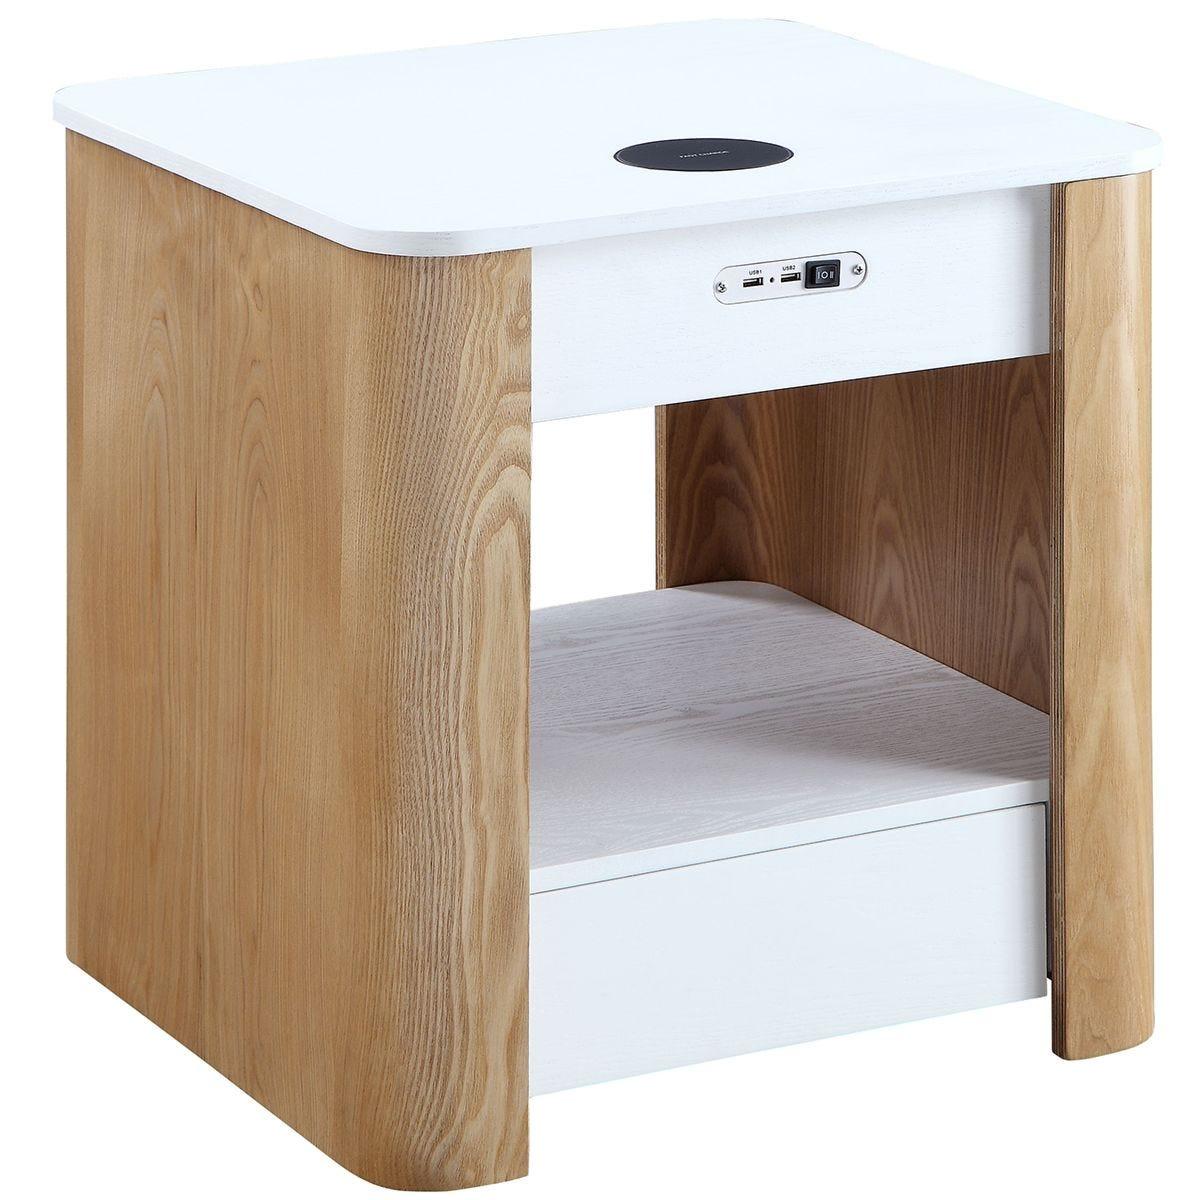 Jual San Francisco Ash/White Smart Bedside Table Wireless Charger & Speaker & Light